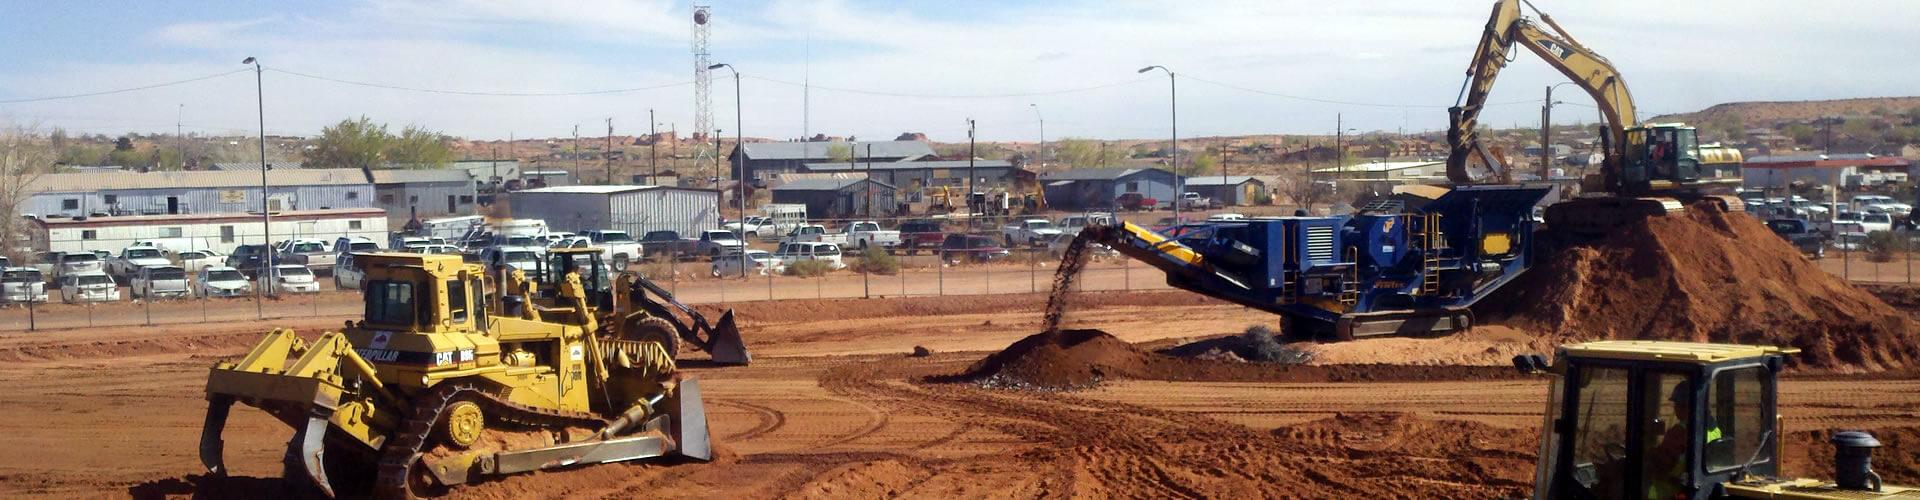 EMC: Site Development with Heavy Equipment